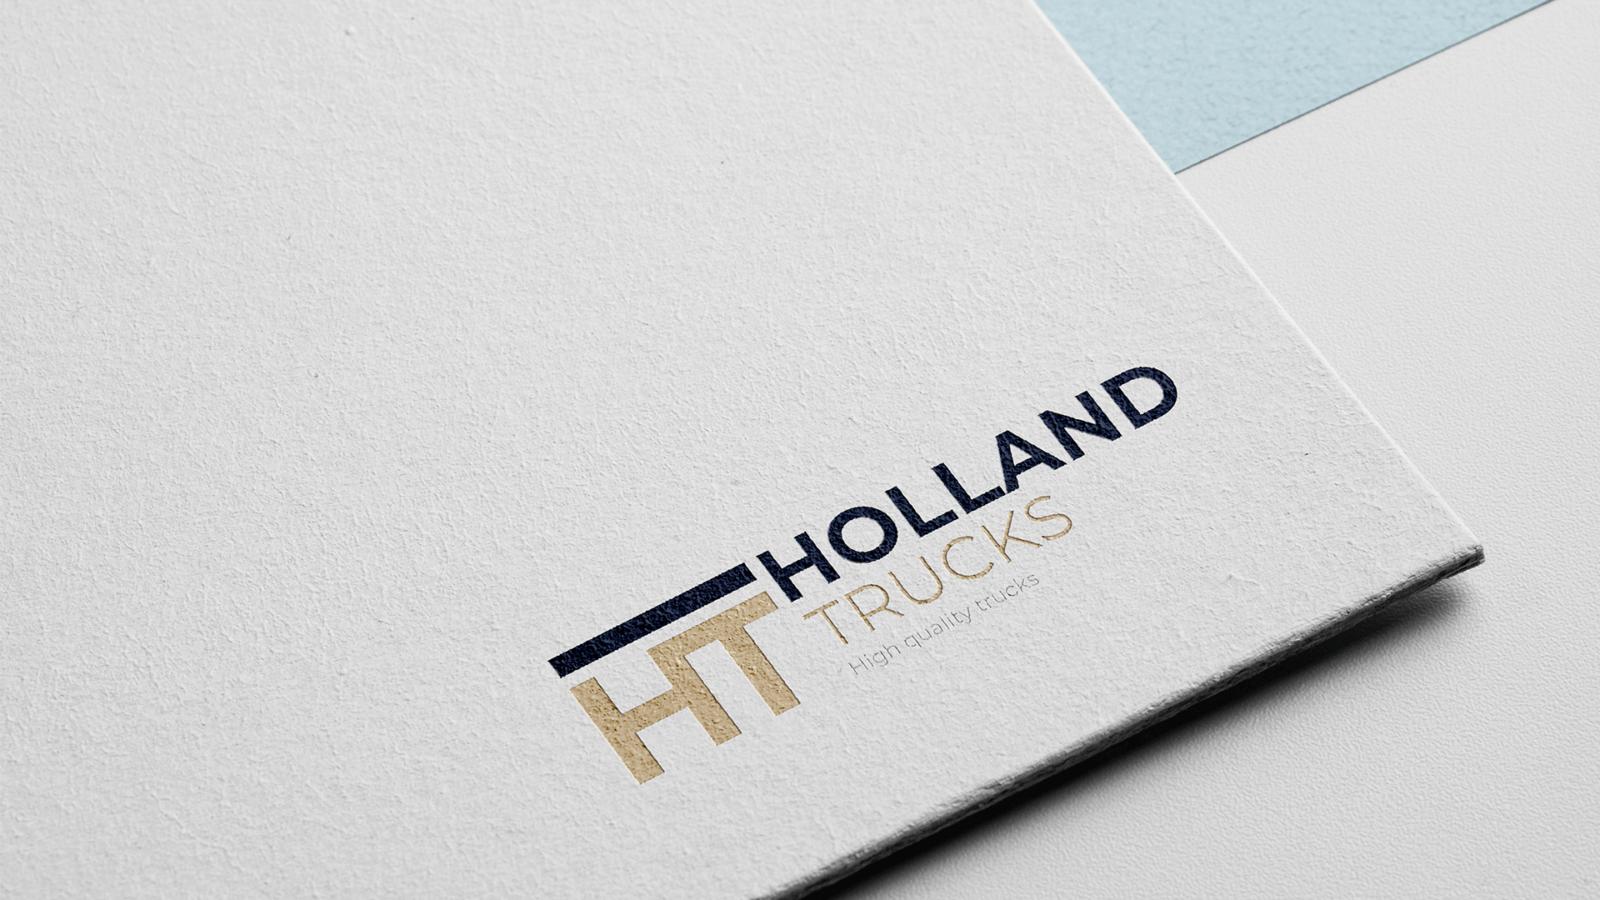 Holland Trucks Identity